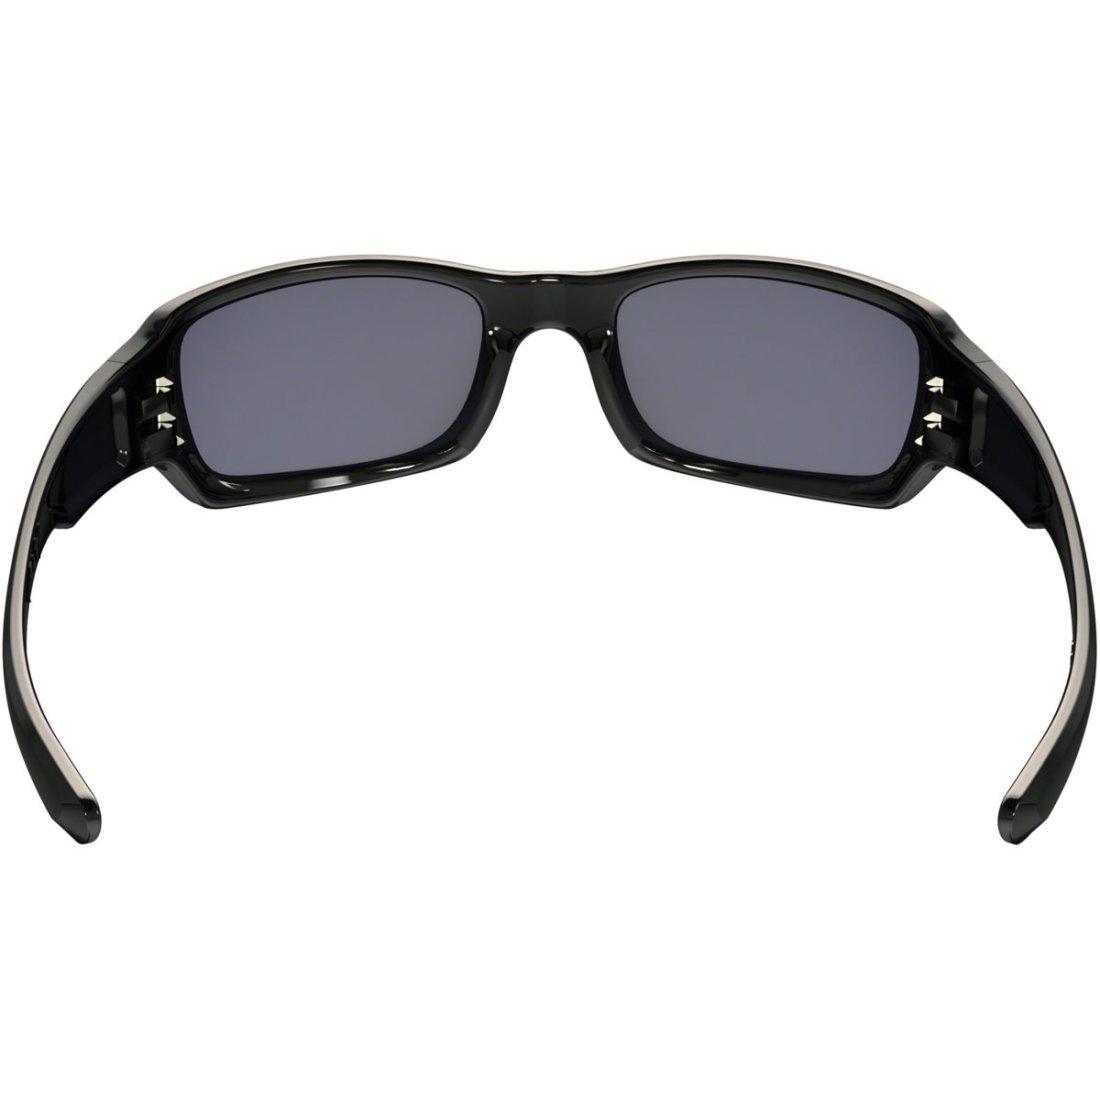 Máscara   Óculos OAKLEY Fives Squared Polished Black   Grey · Motocard 57a635bc29